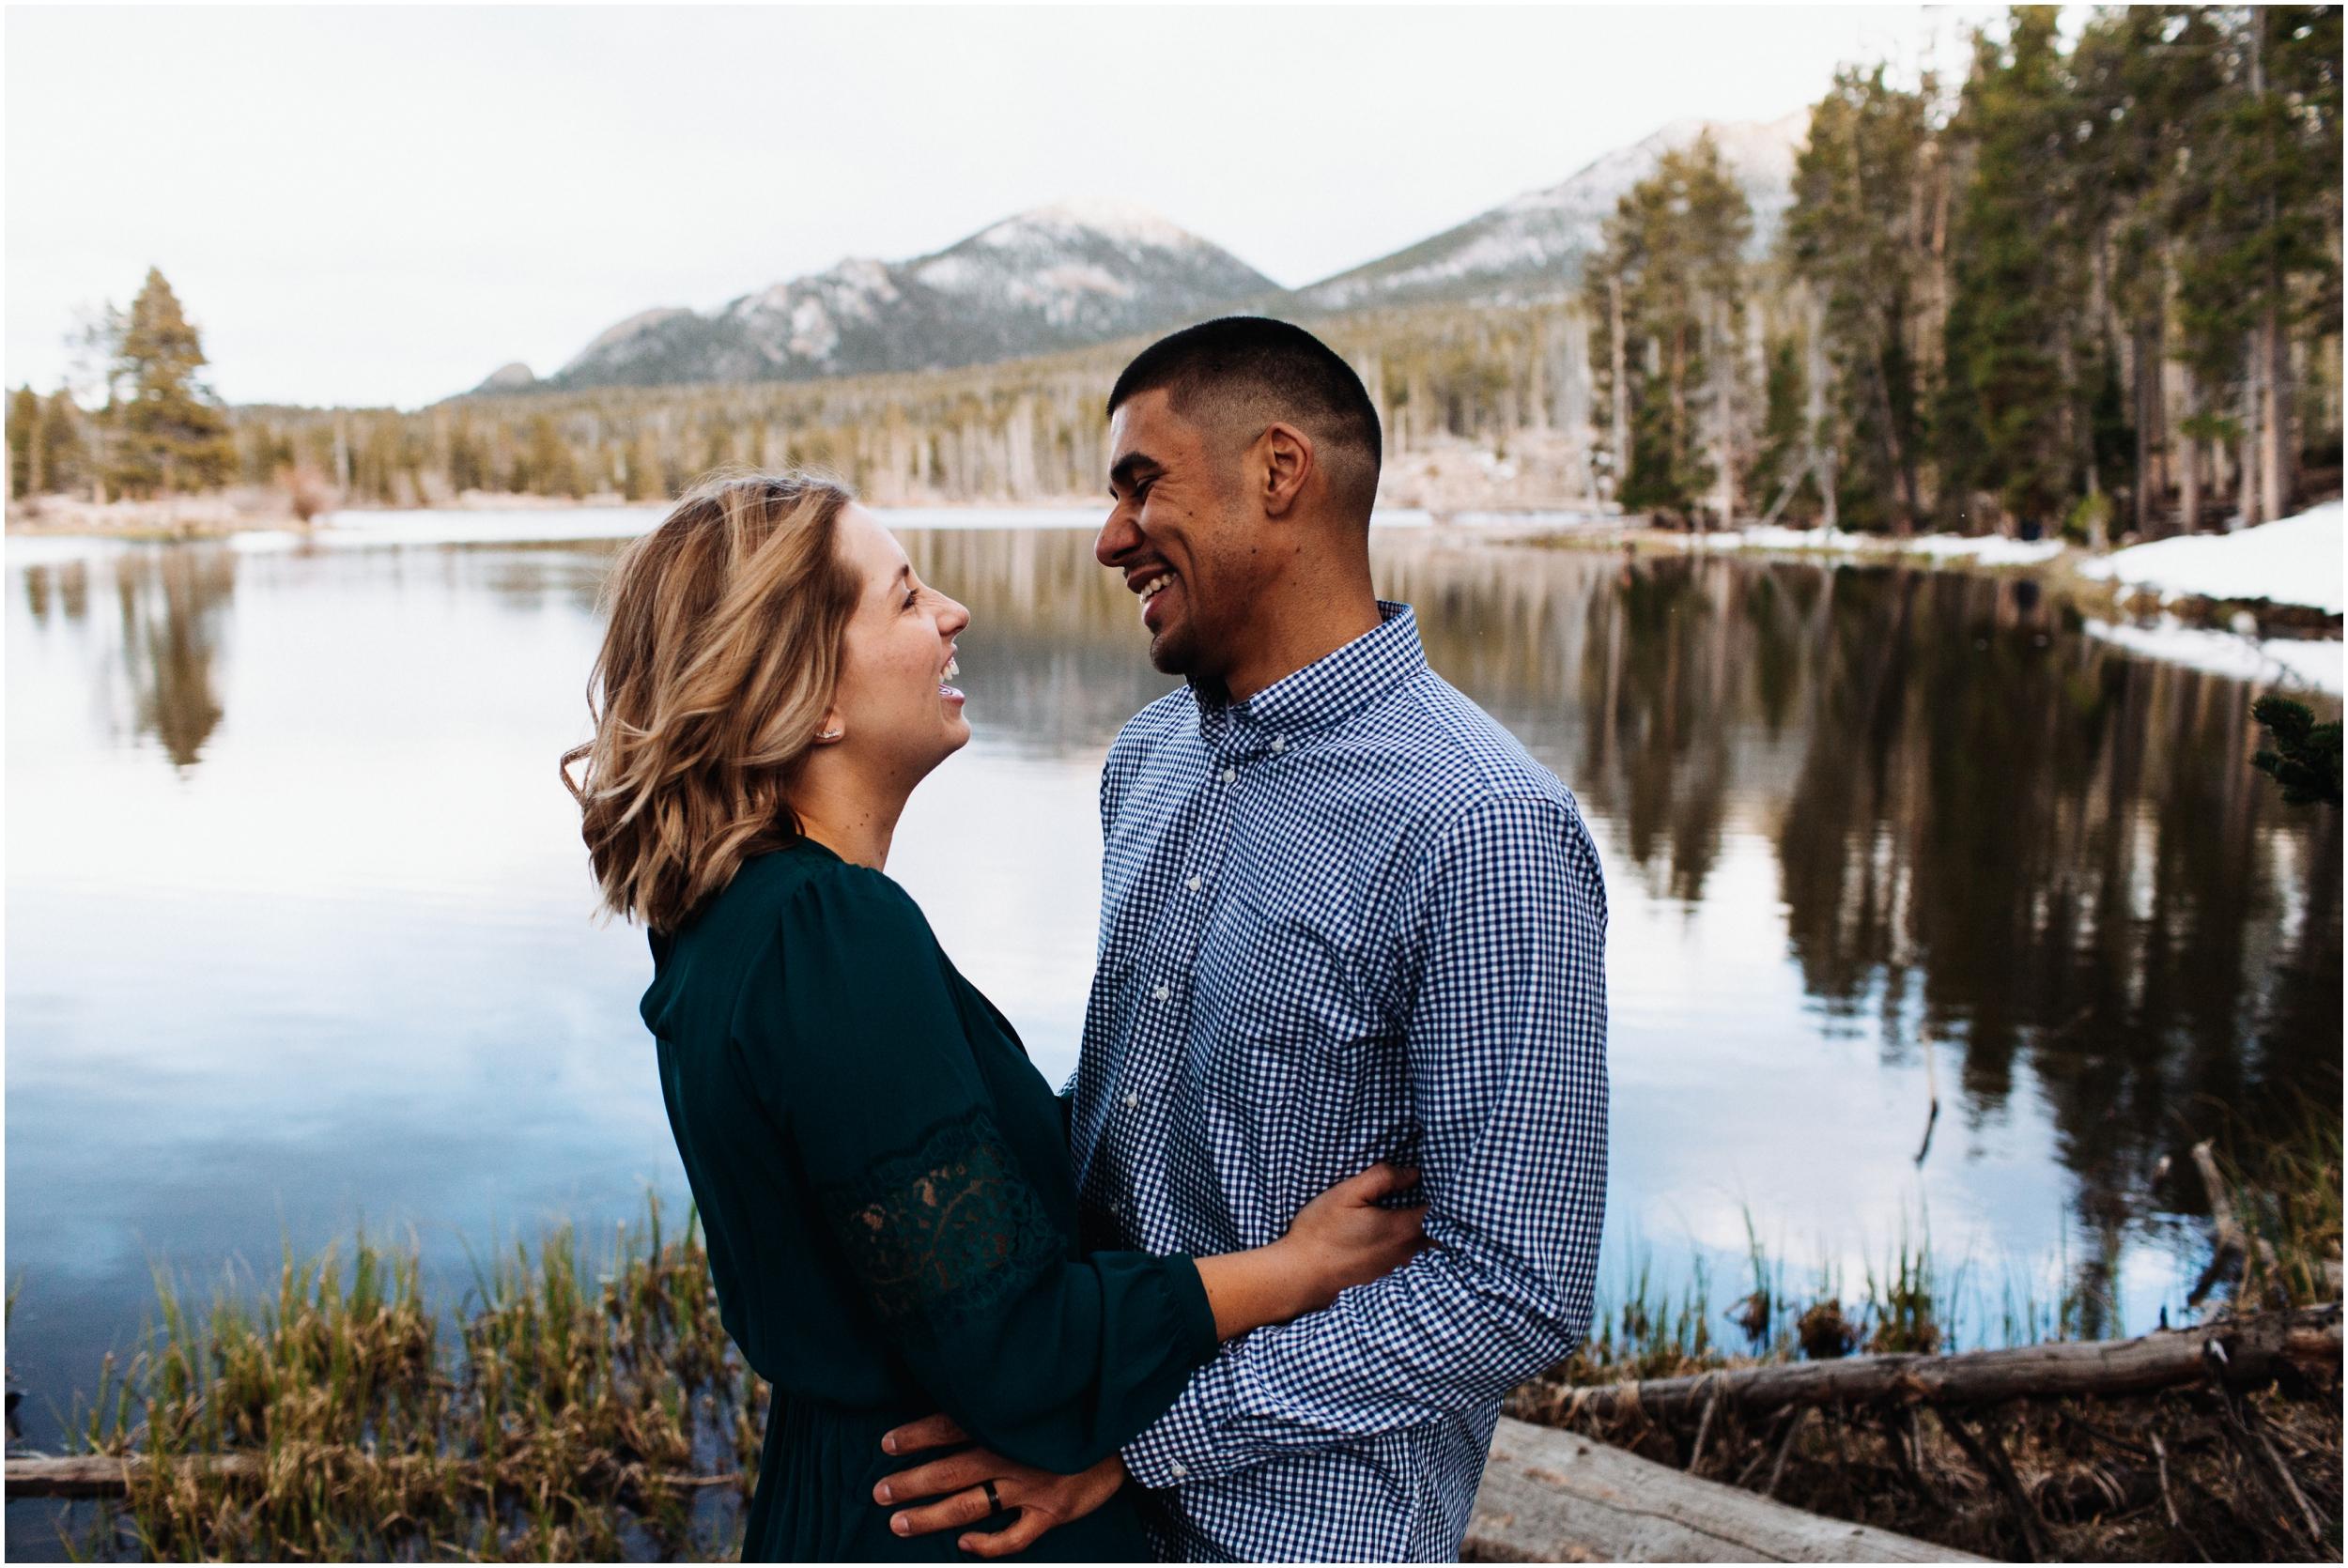 rocky-mountain-national-park-elopement-sprague-lake-colorado-adventure-wedding-photographer_taylor-powers_170.jpg